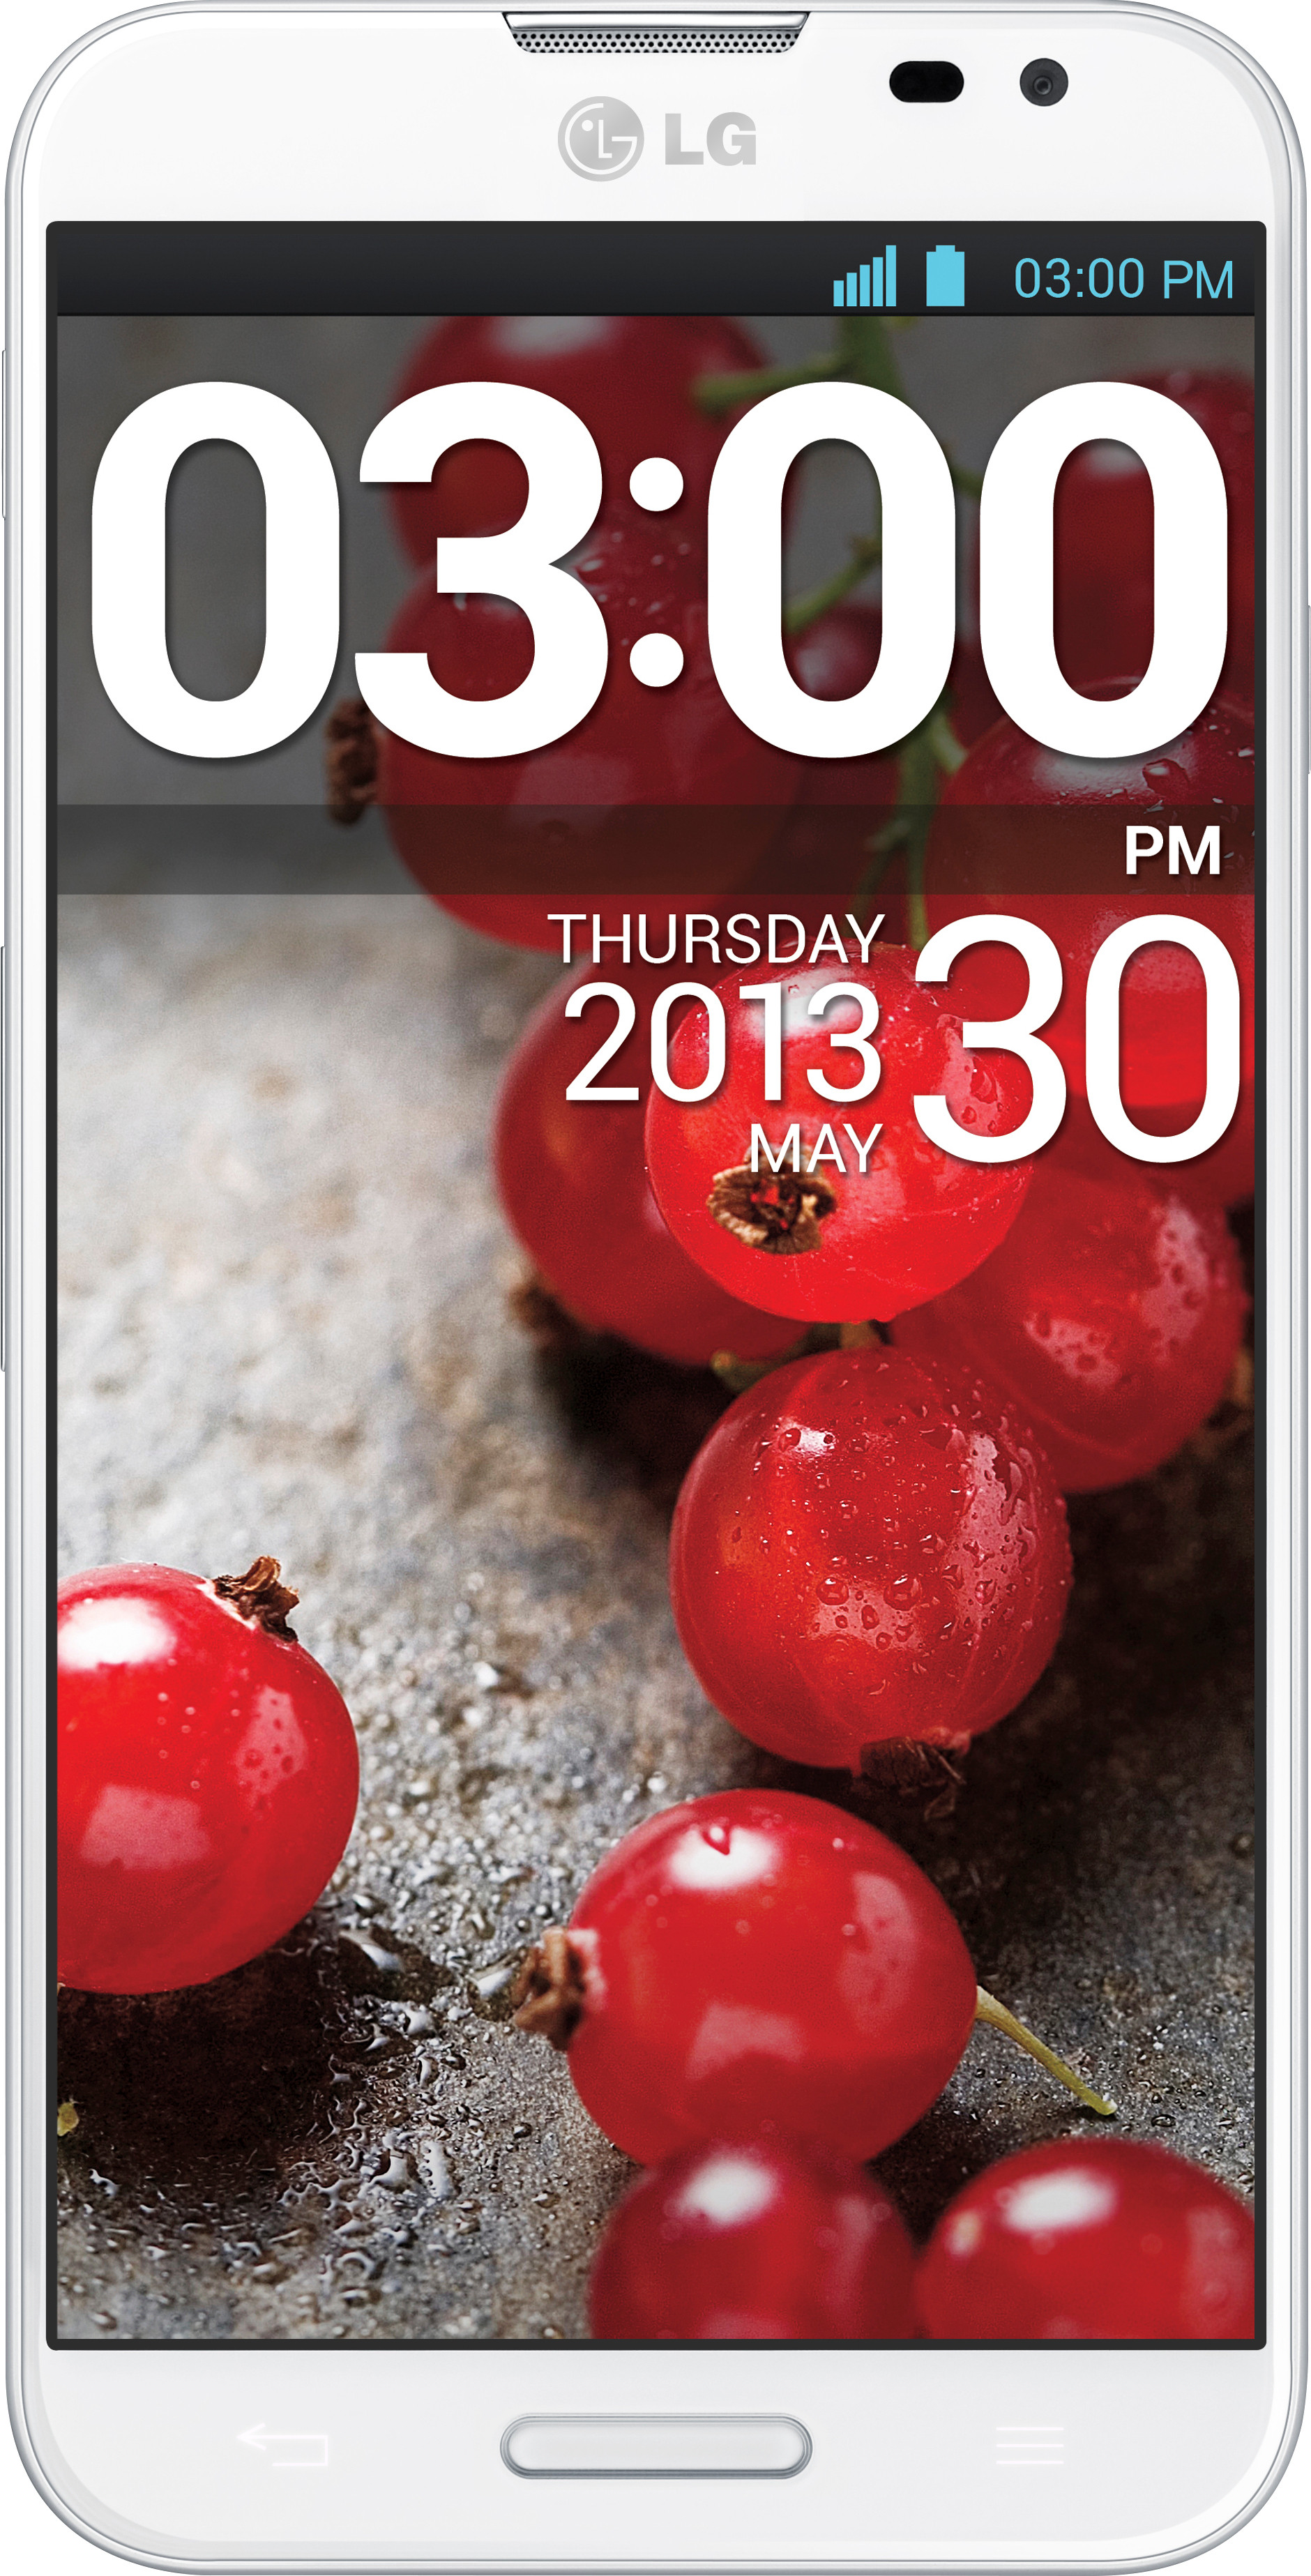 LG Optimus G Pro (E988) (White, 16 GB)(2 GB RAM)